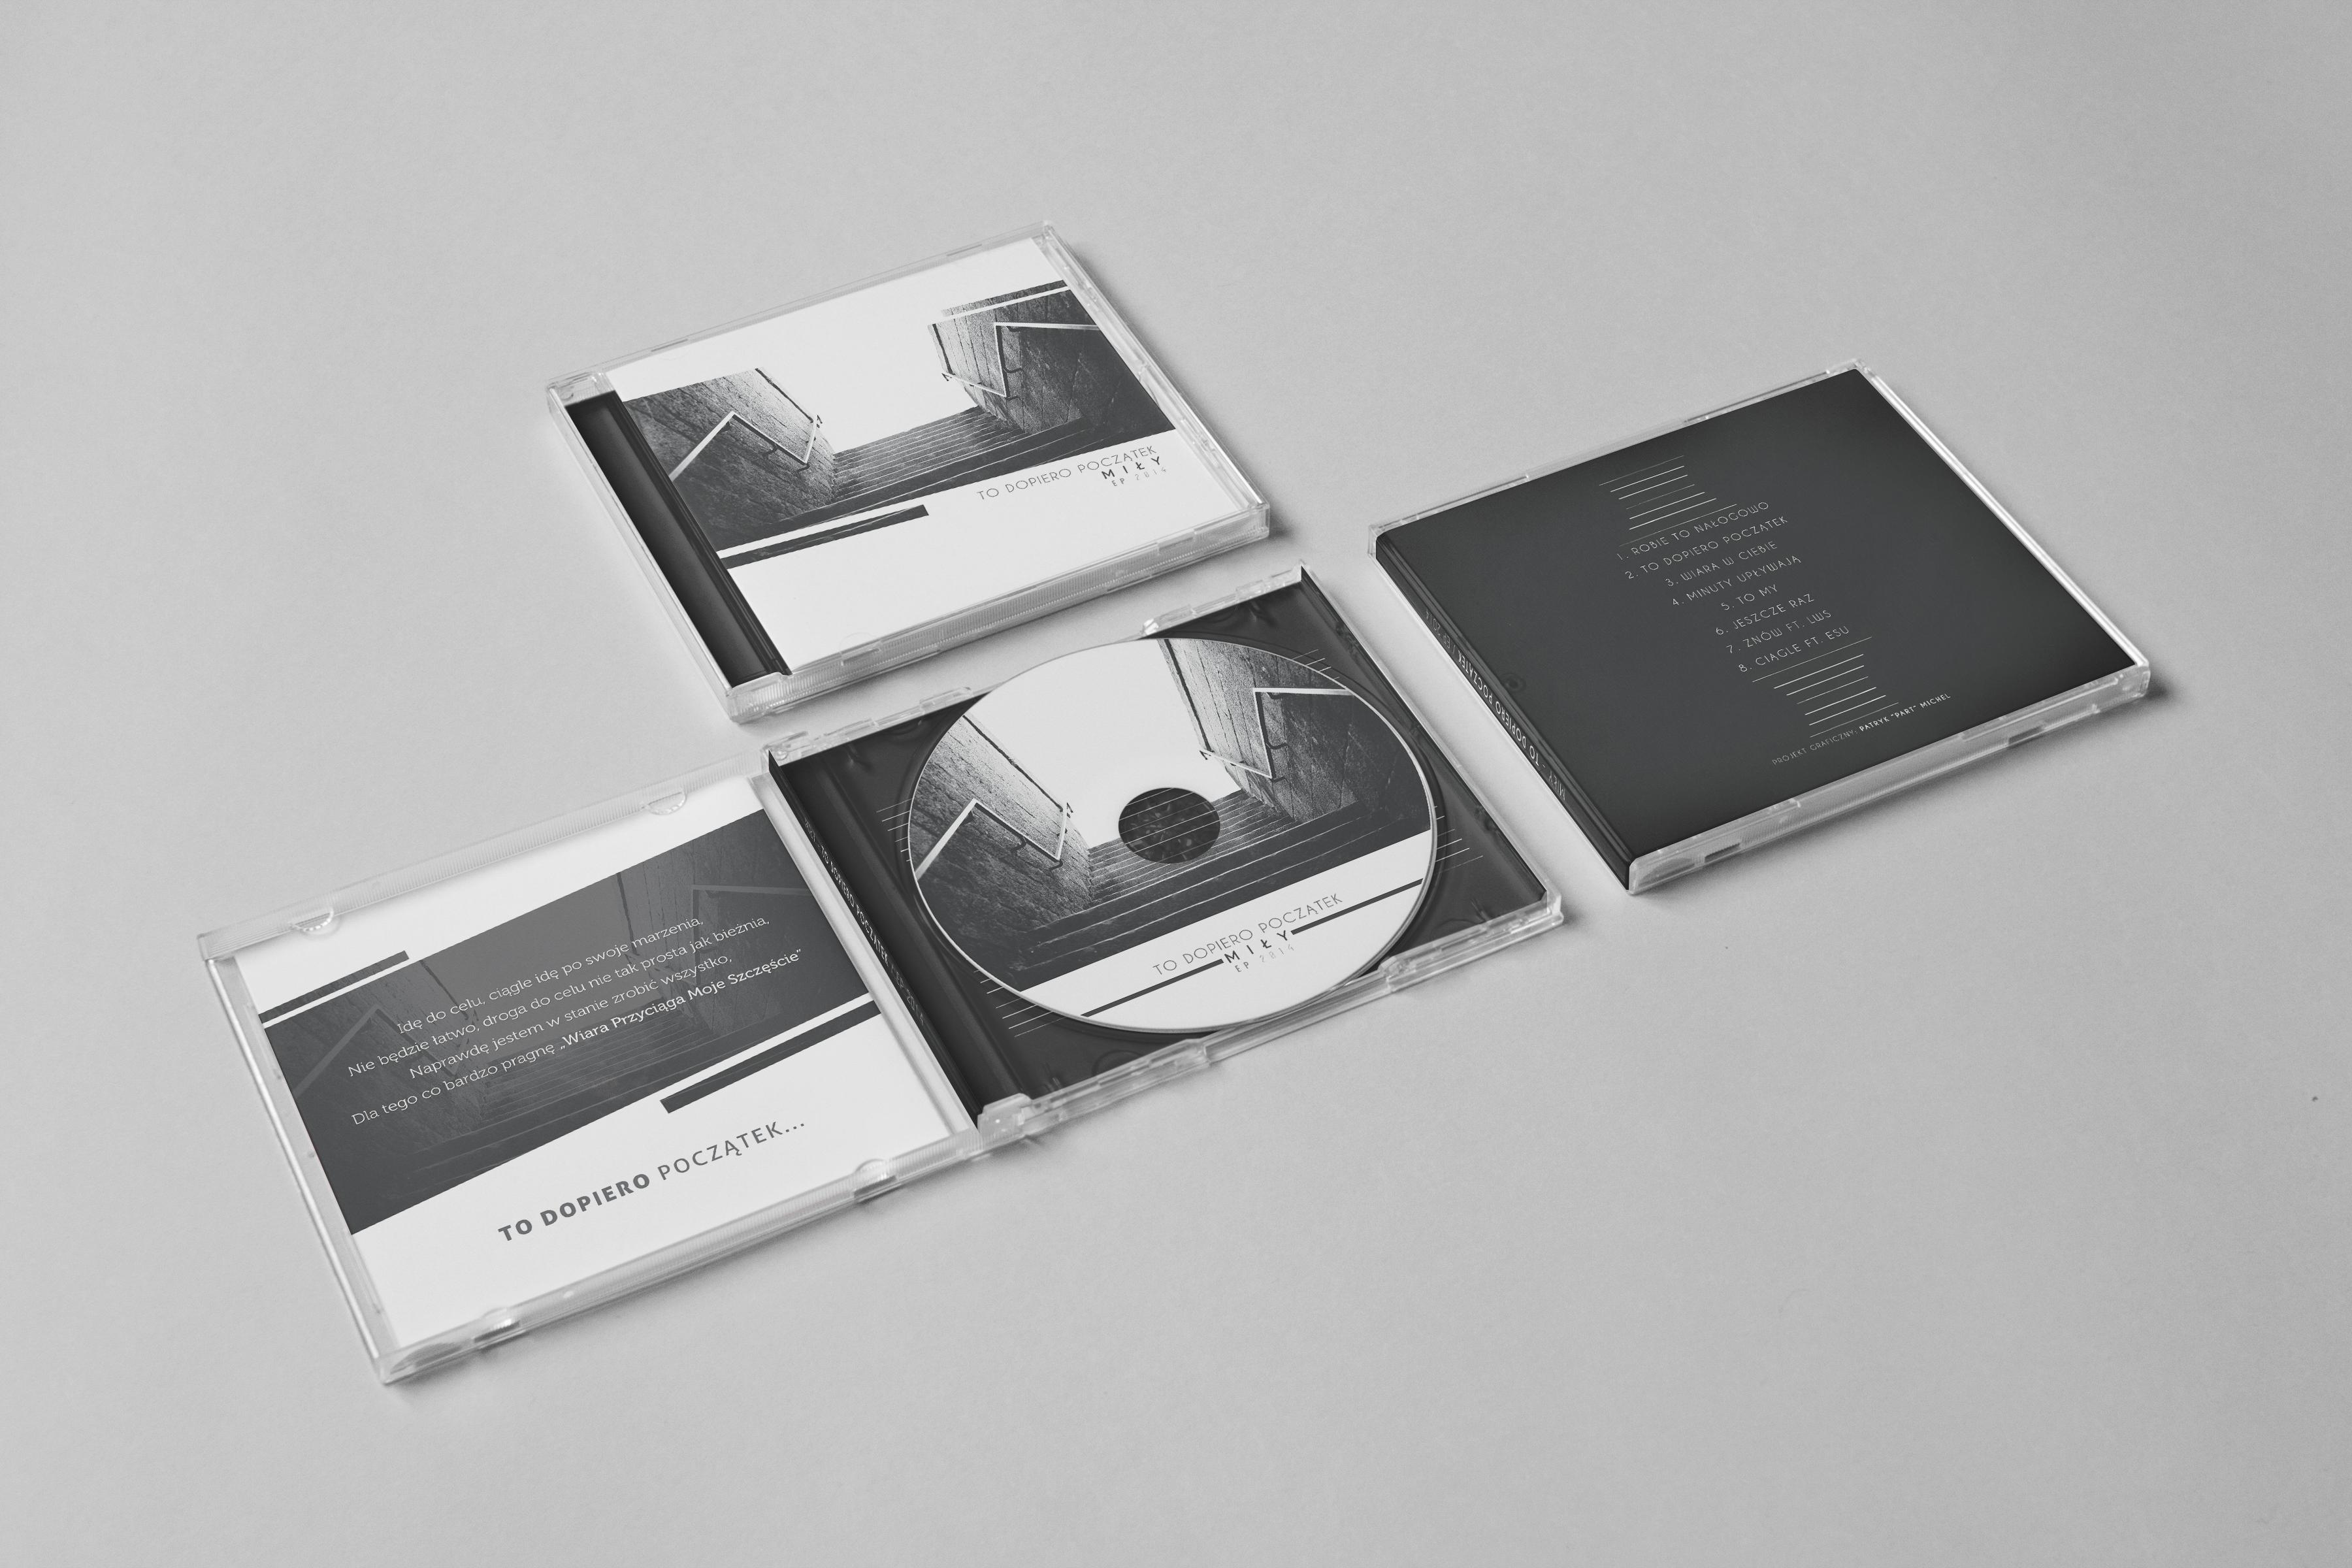 Mily - To Dopiero Poczatek / CD COVER ALBUM MOCKUP by Patrydinho ...